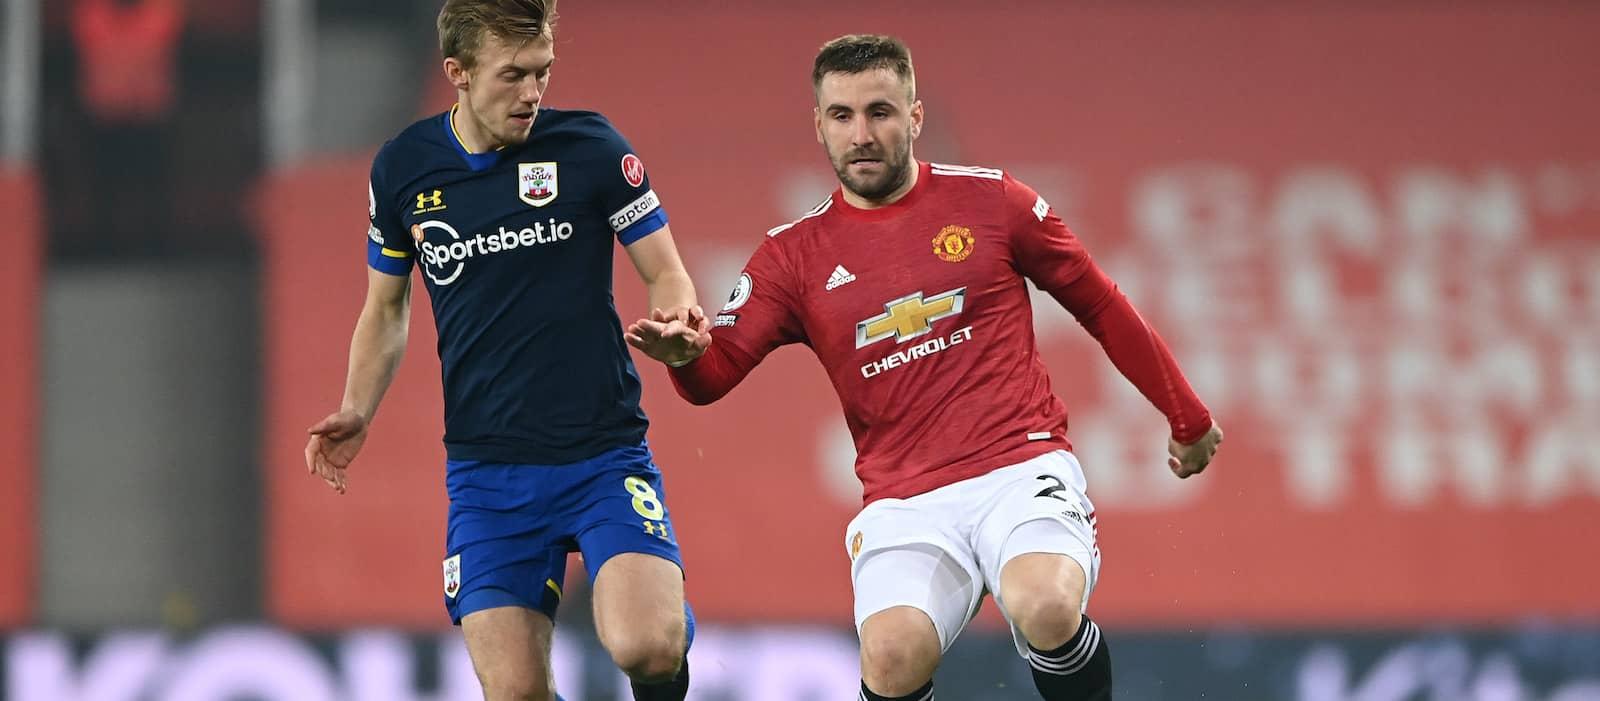 Luke Shaw's statistics show his brilliance vs Southampton